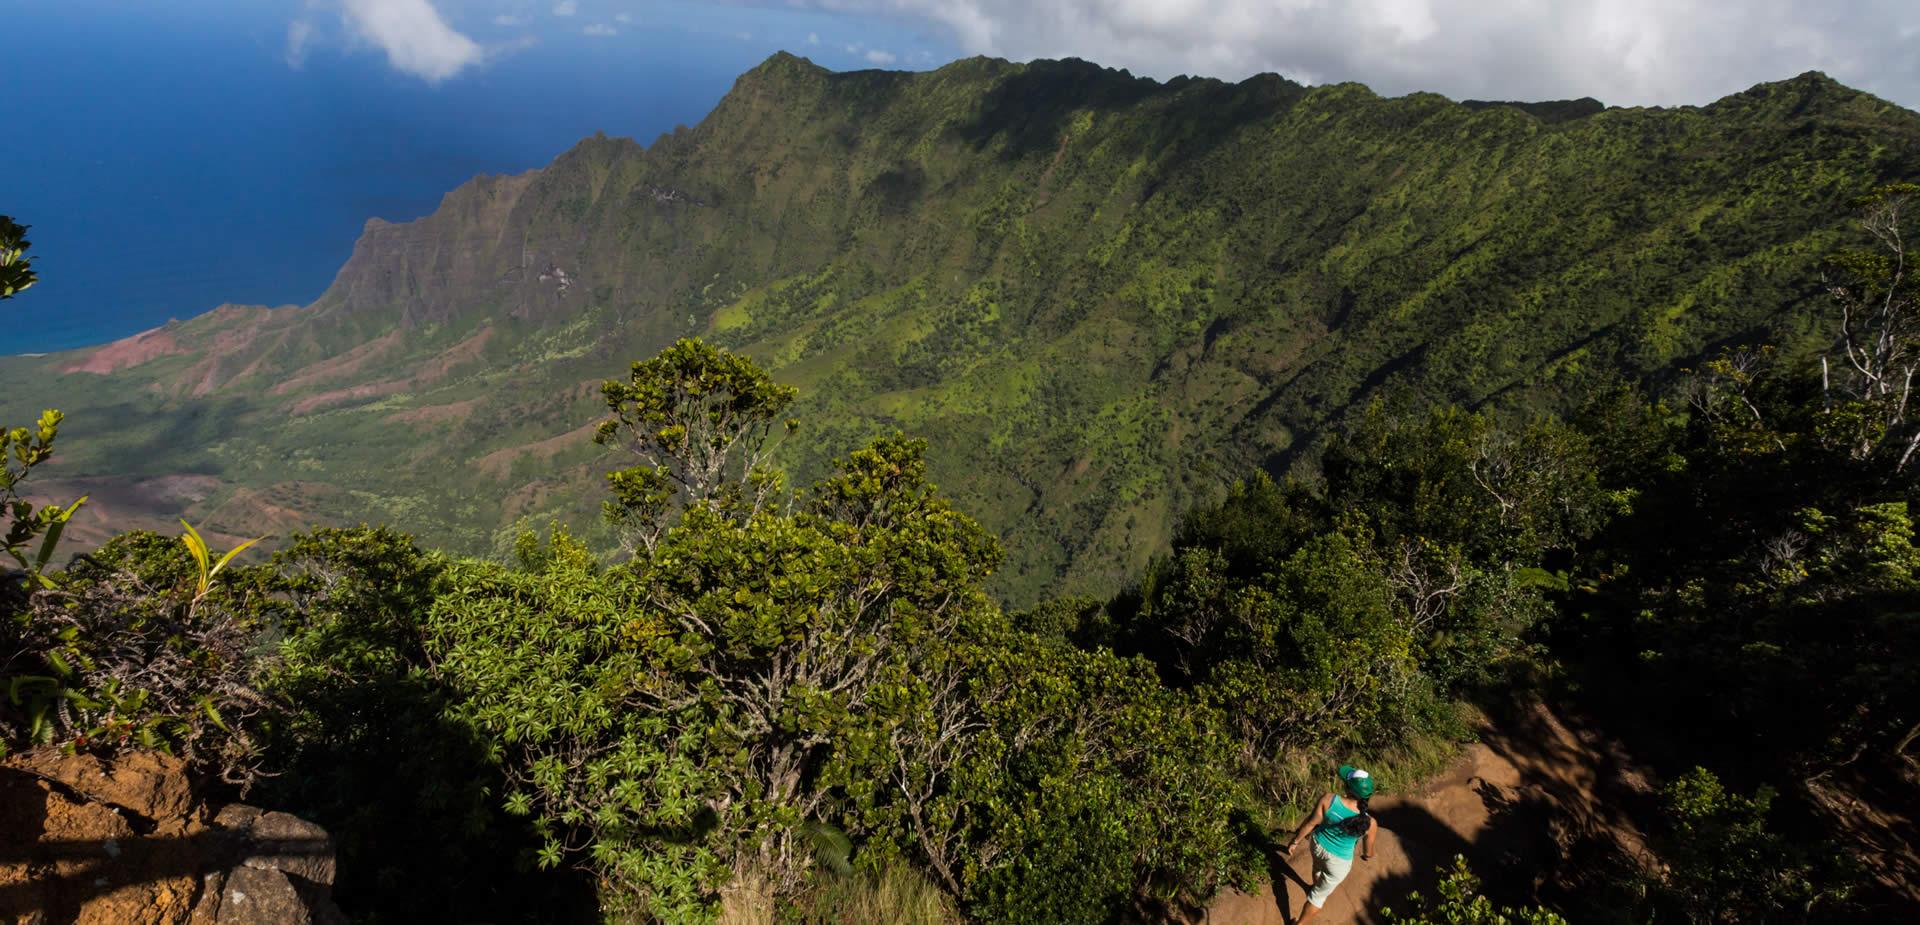 Honeymoon in Hawaii by Muriel Saldalamacchia